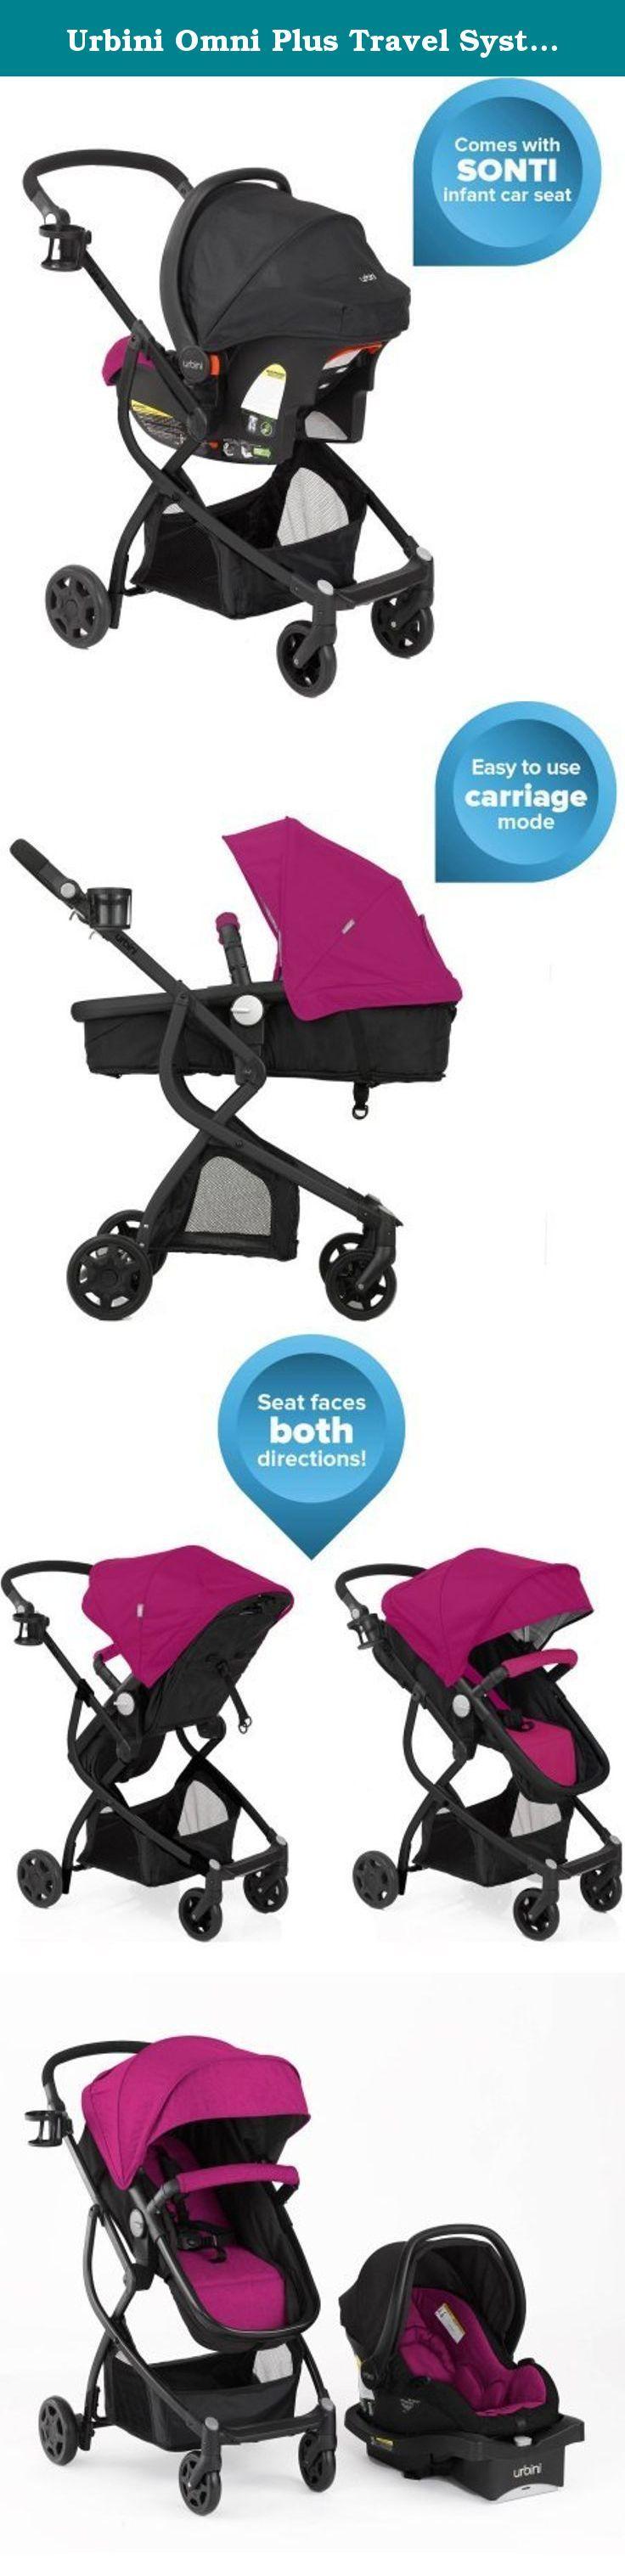 Urbini Omni Plus Travel System Reversible Stroller